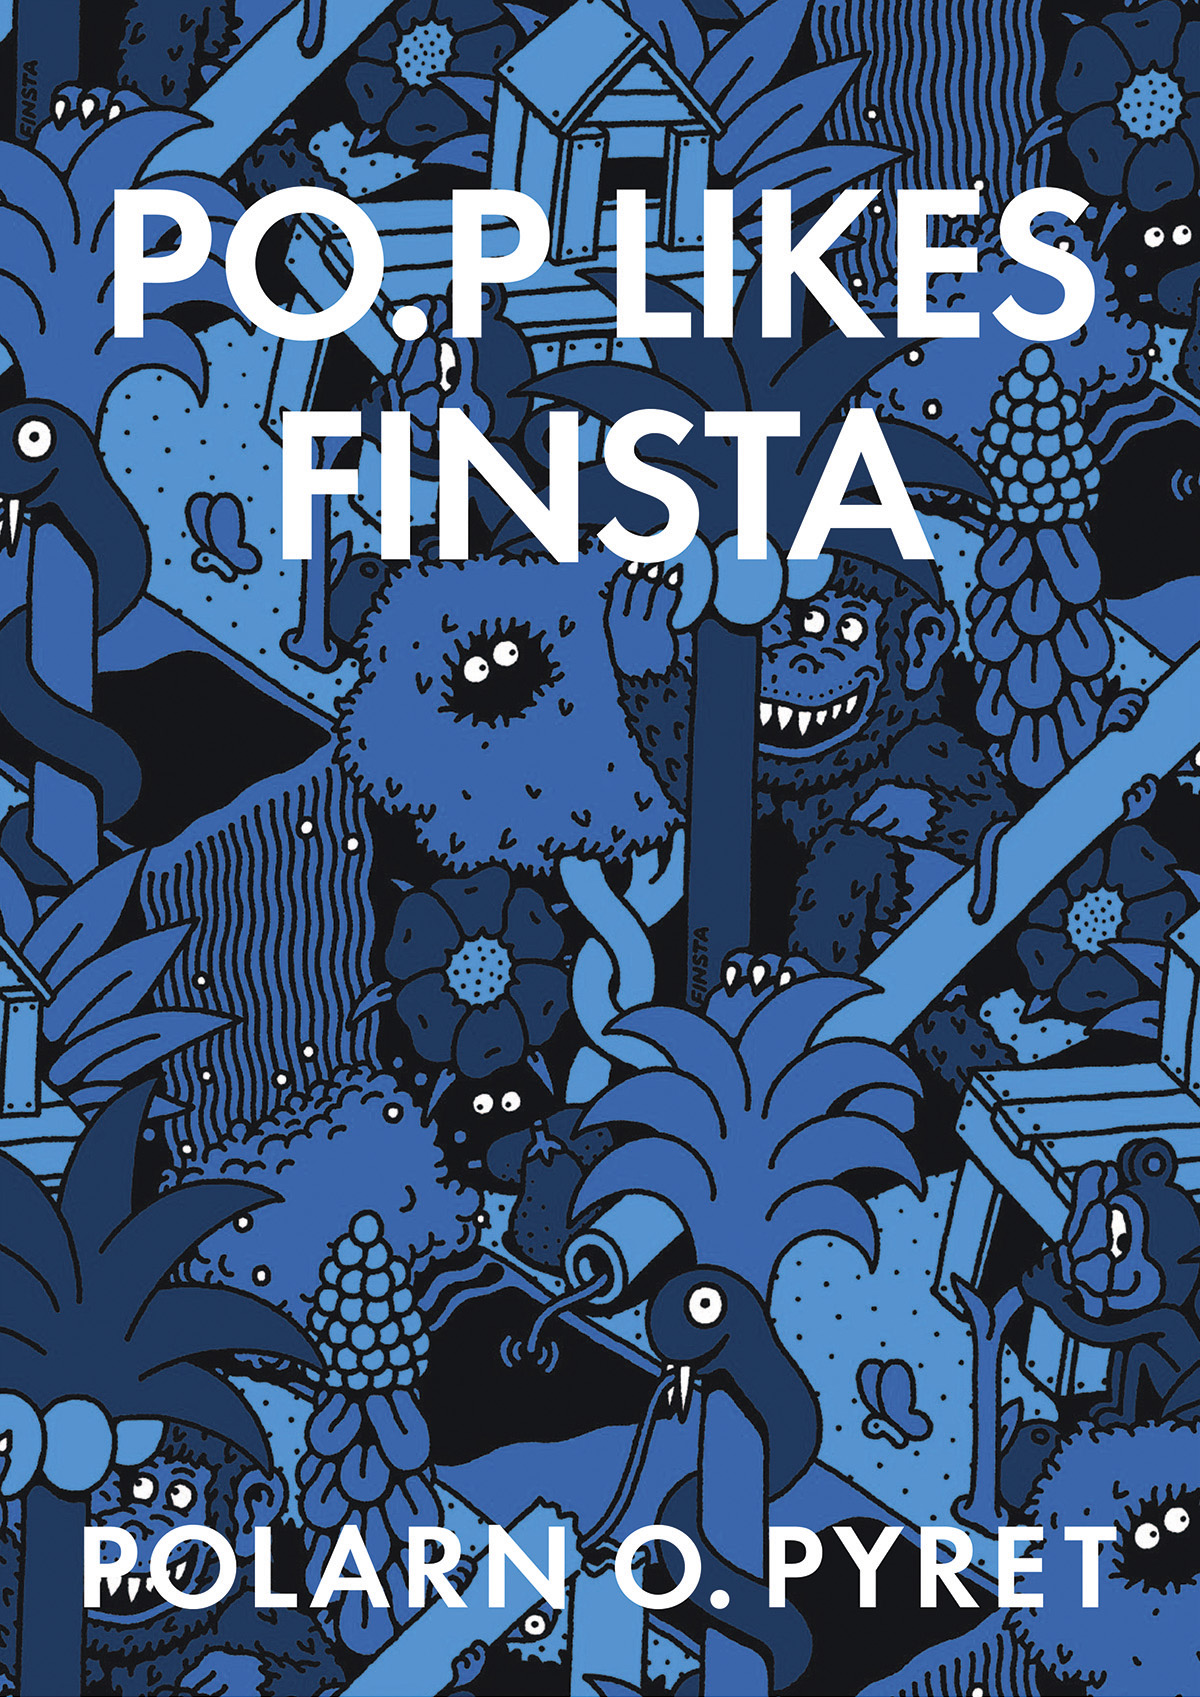 P O. P likes Finsta